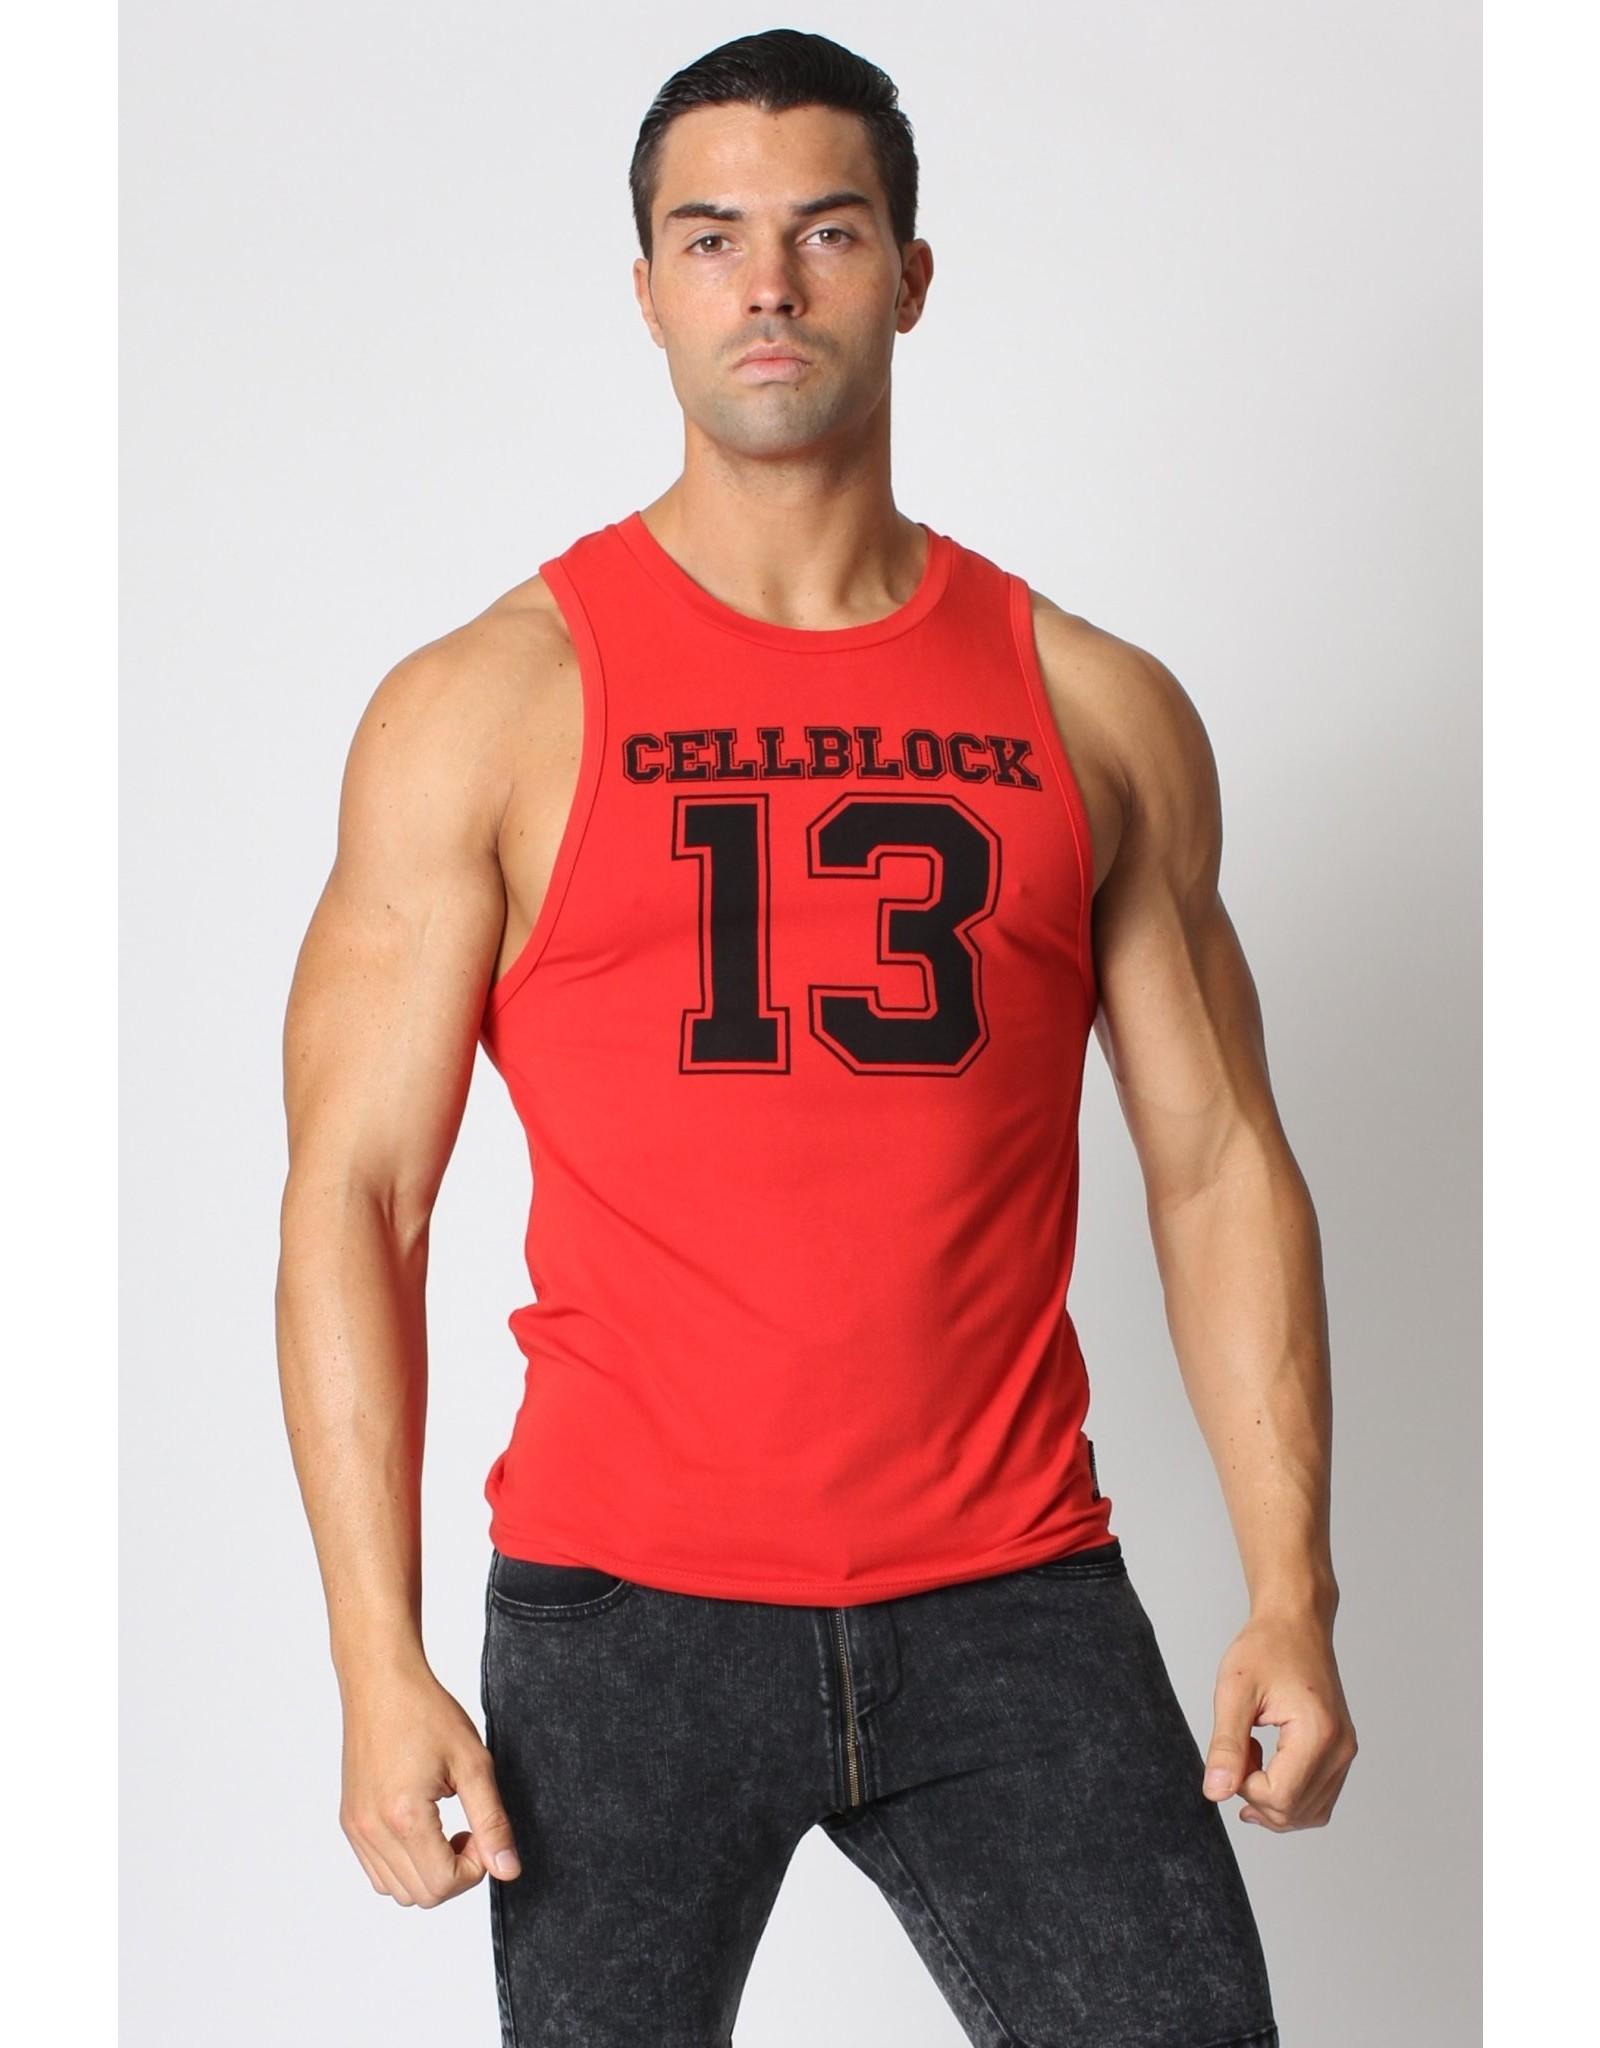 Cellblock13 Cellblock13 Stadium Tank